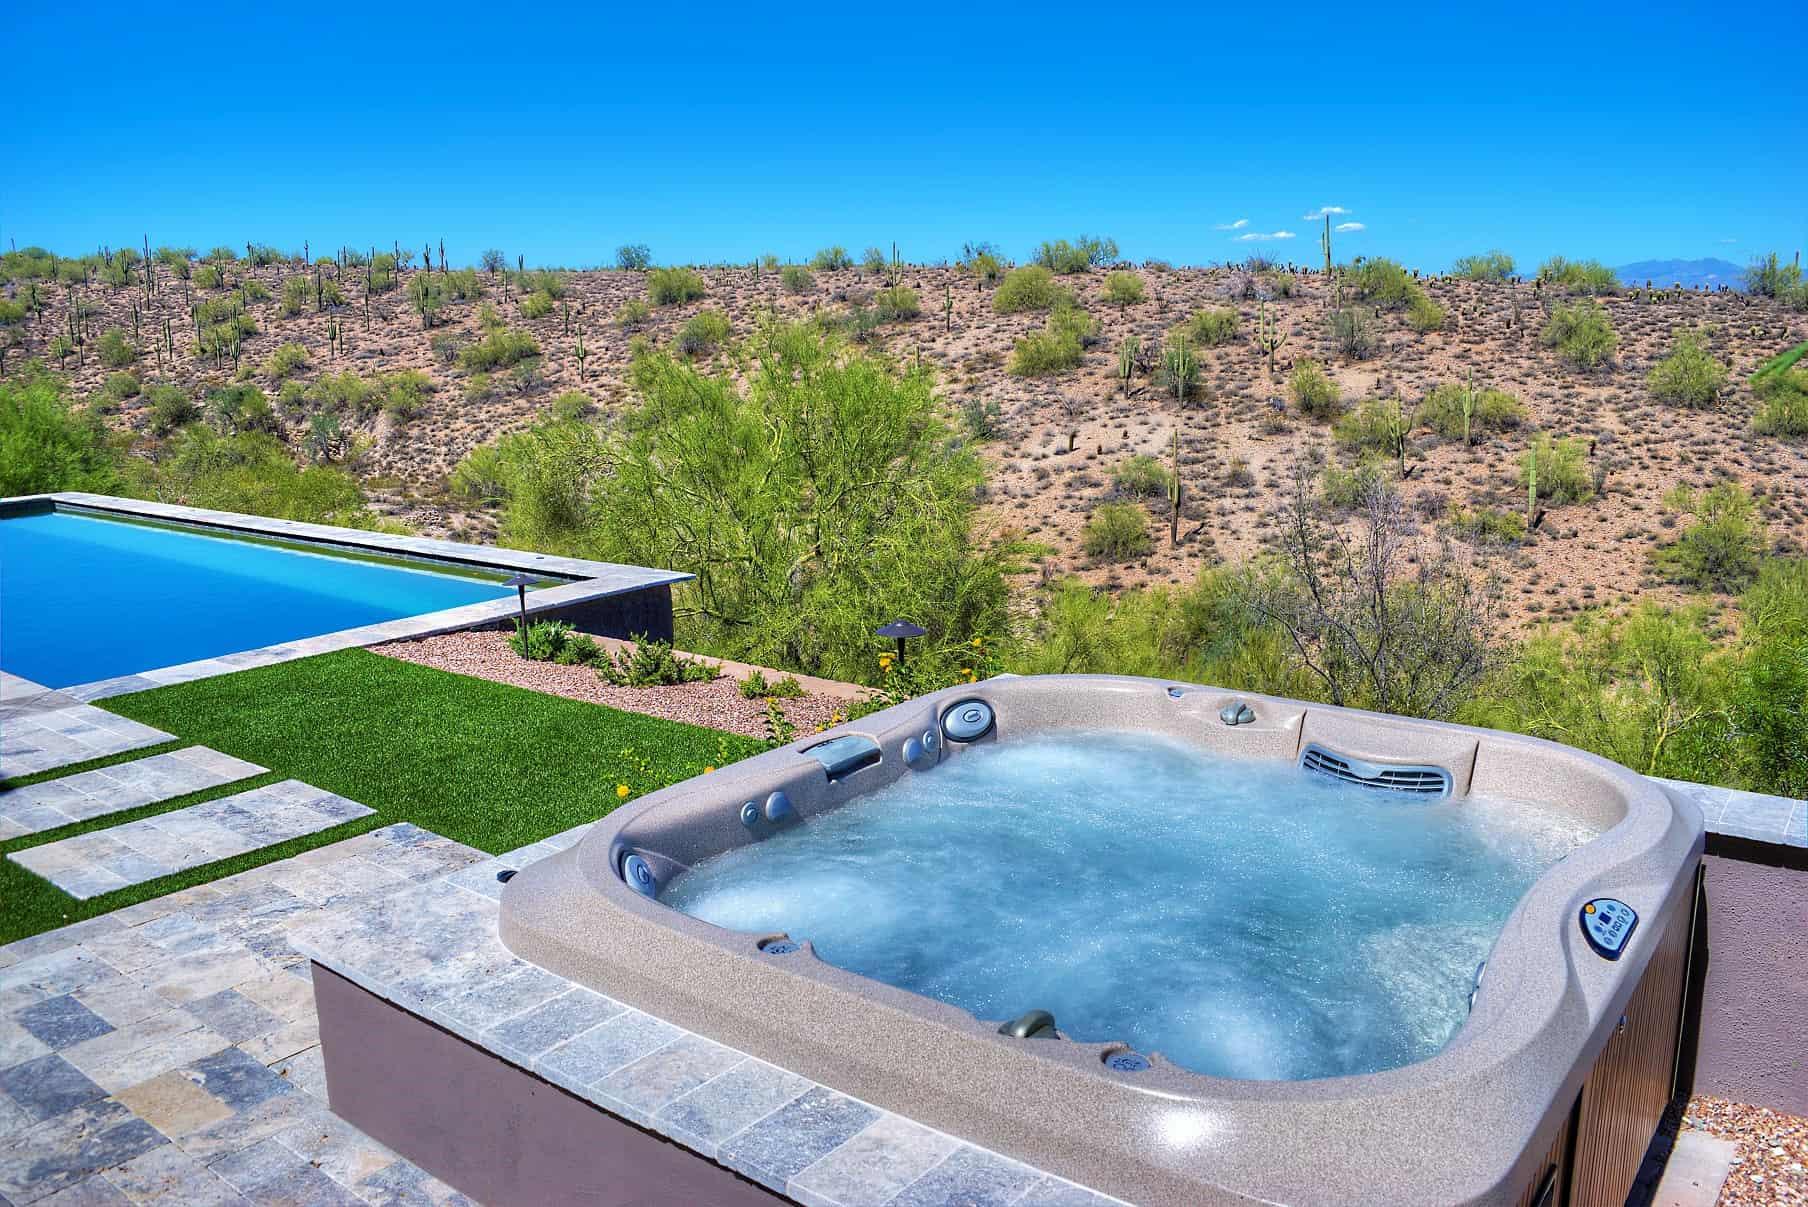 Imagine Backyard Living Hot Tub Spa Jacuzzi Sundance (31)